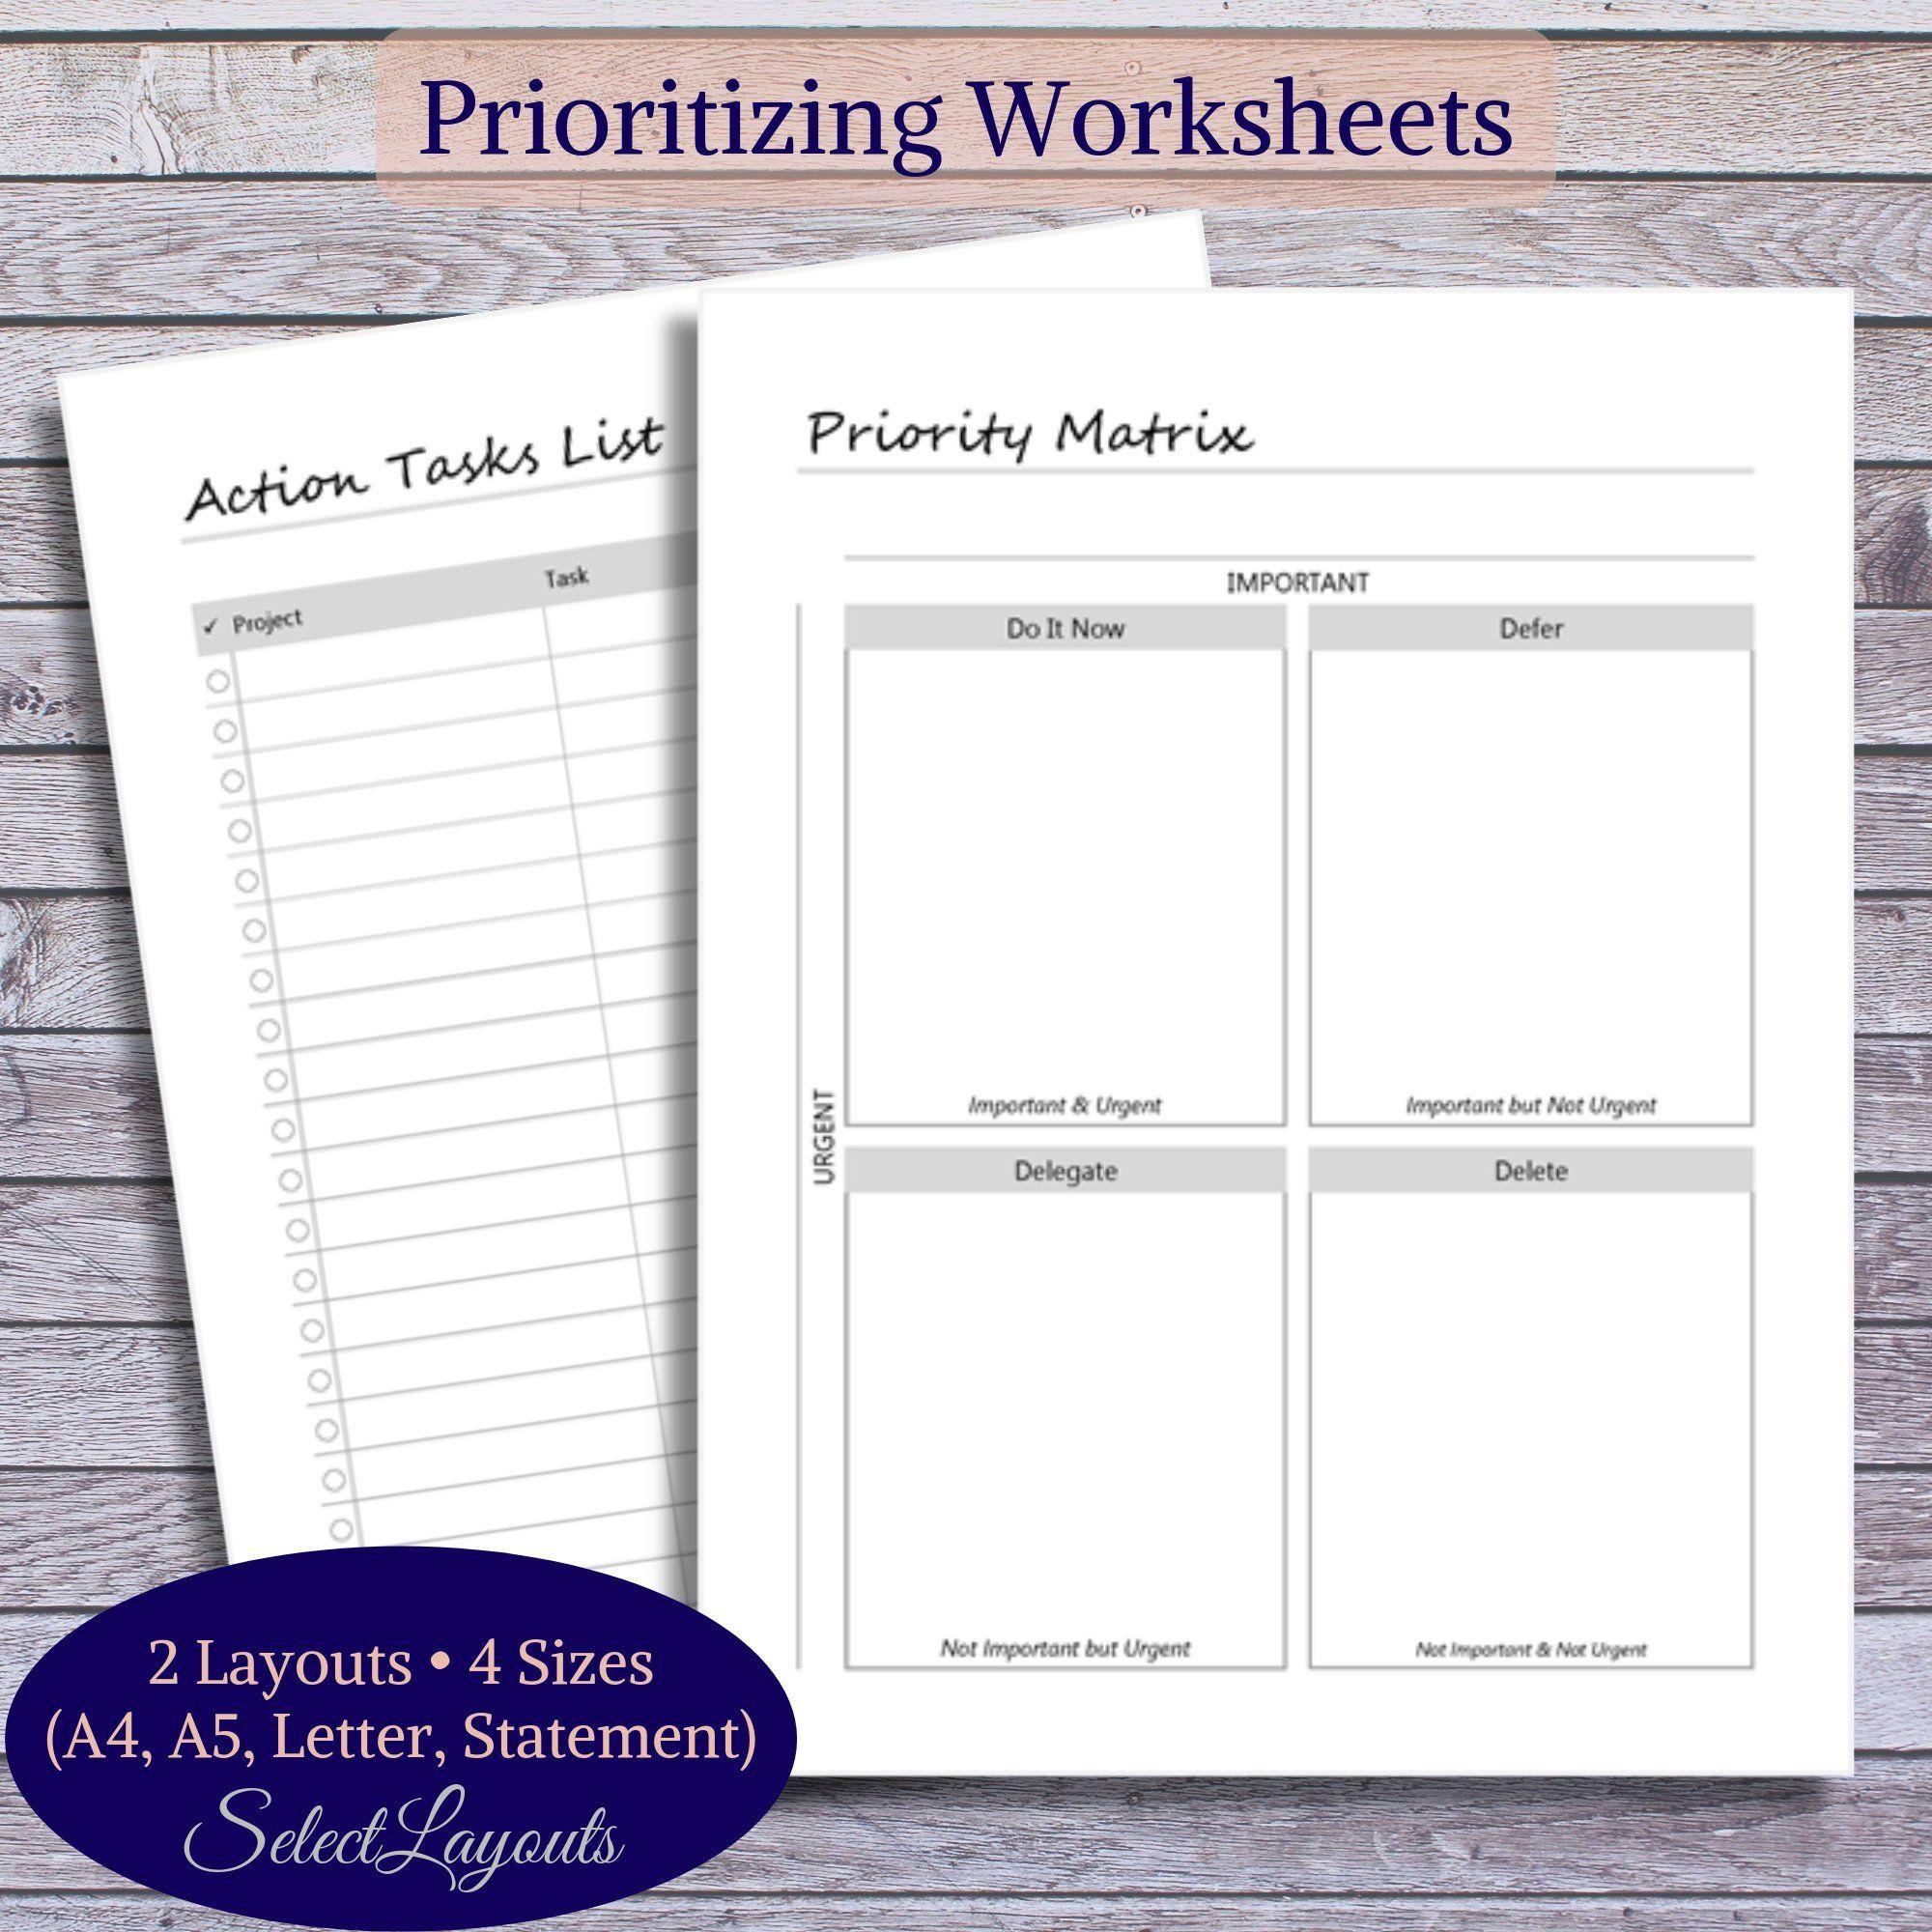 Prioritizing Worksheets